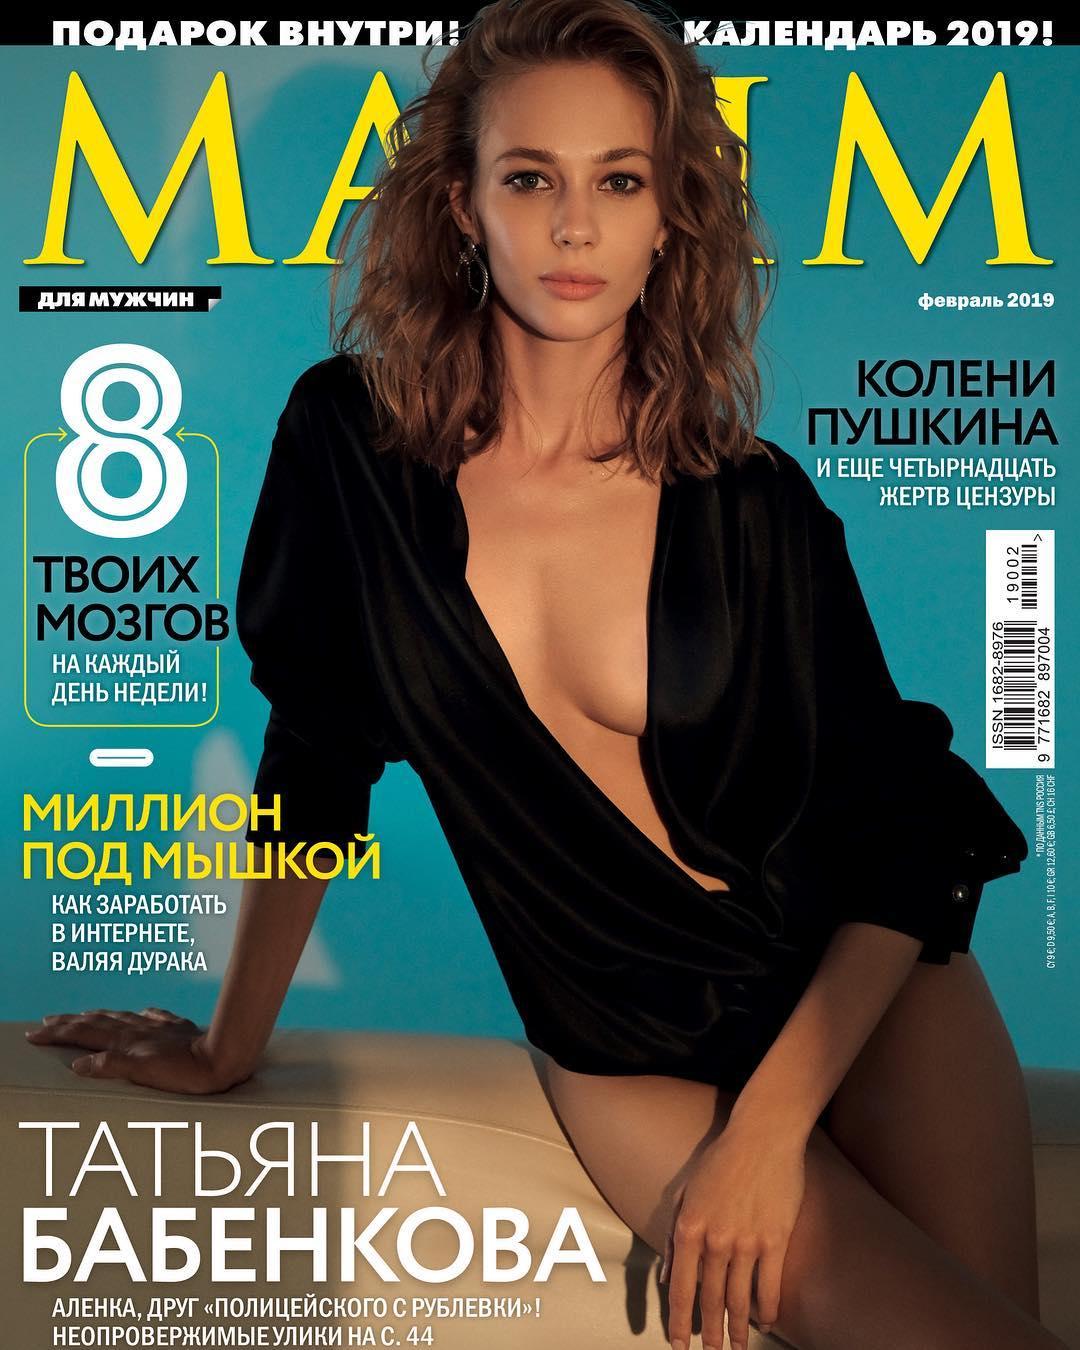 Татьяна Бабенкова — звезда Полицеского сРублёвки разделась для журнала MAXIM